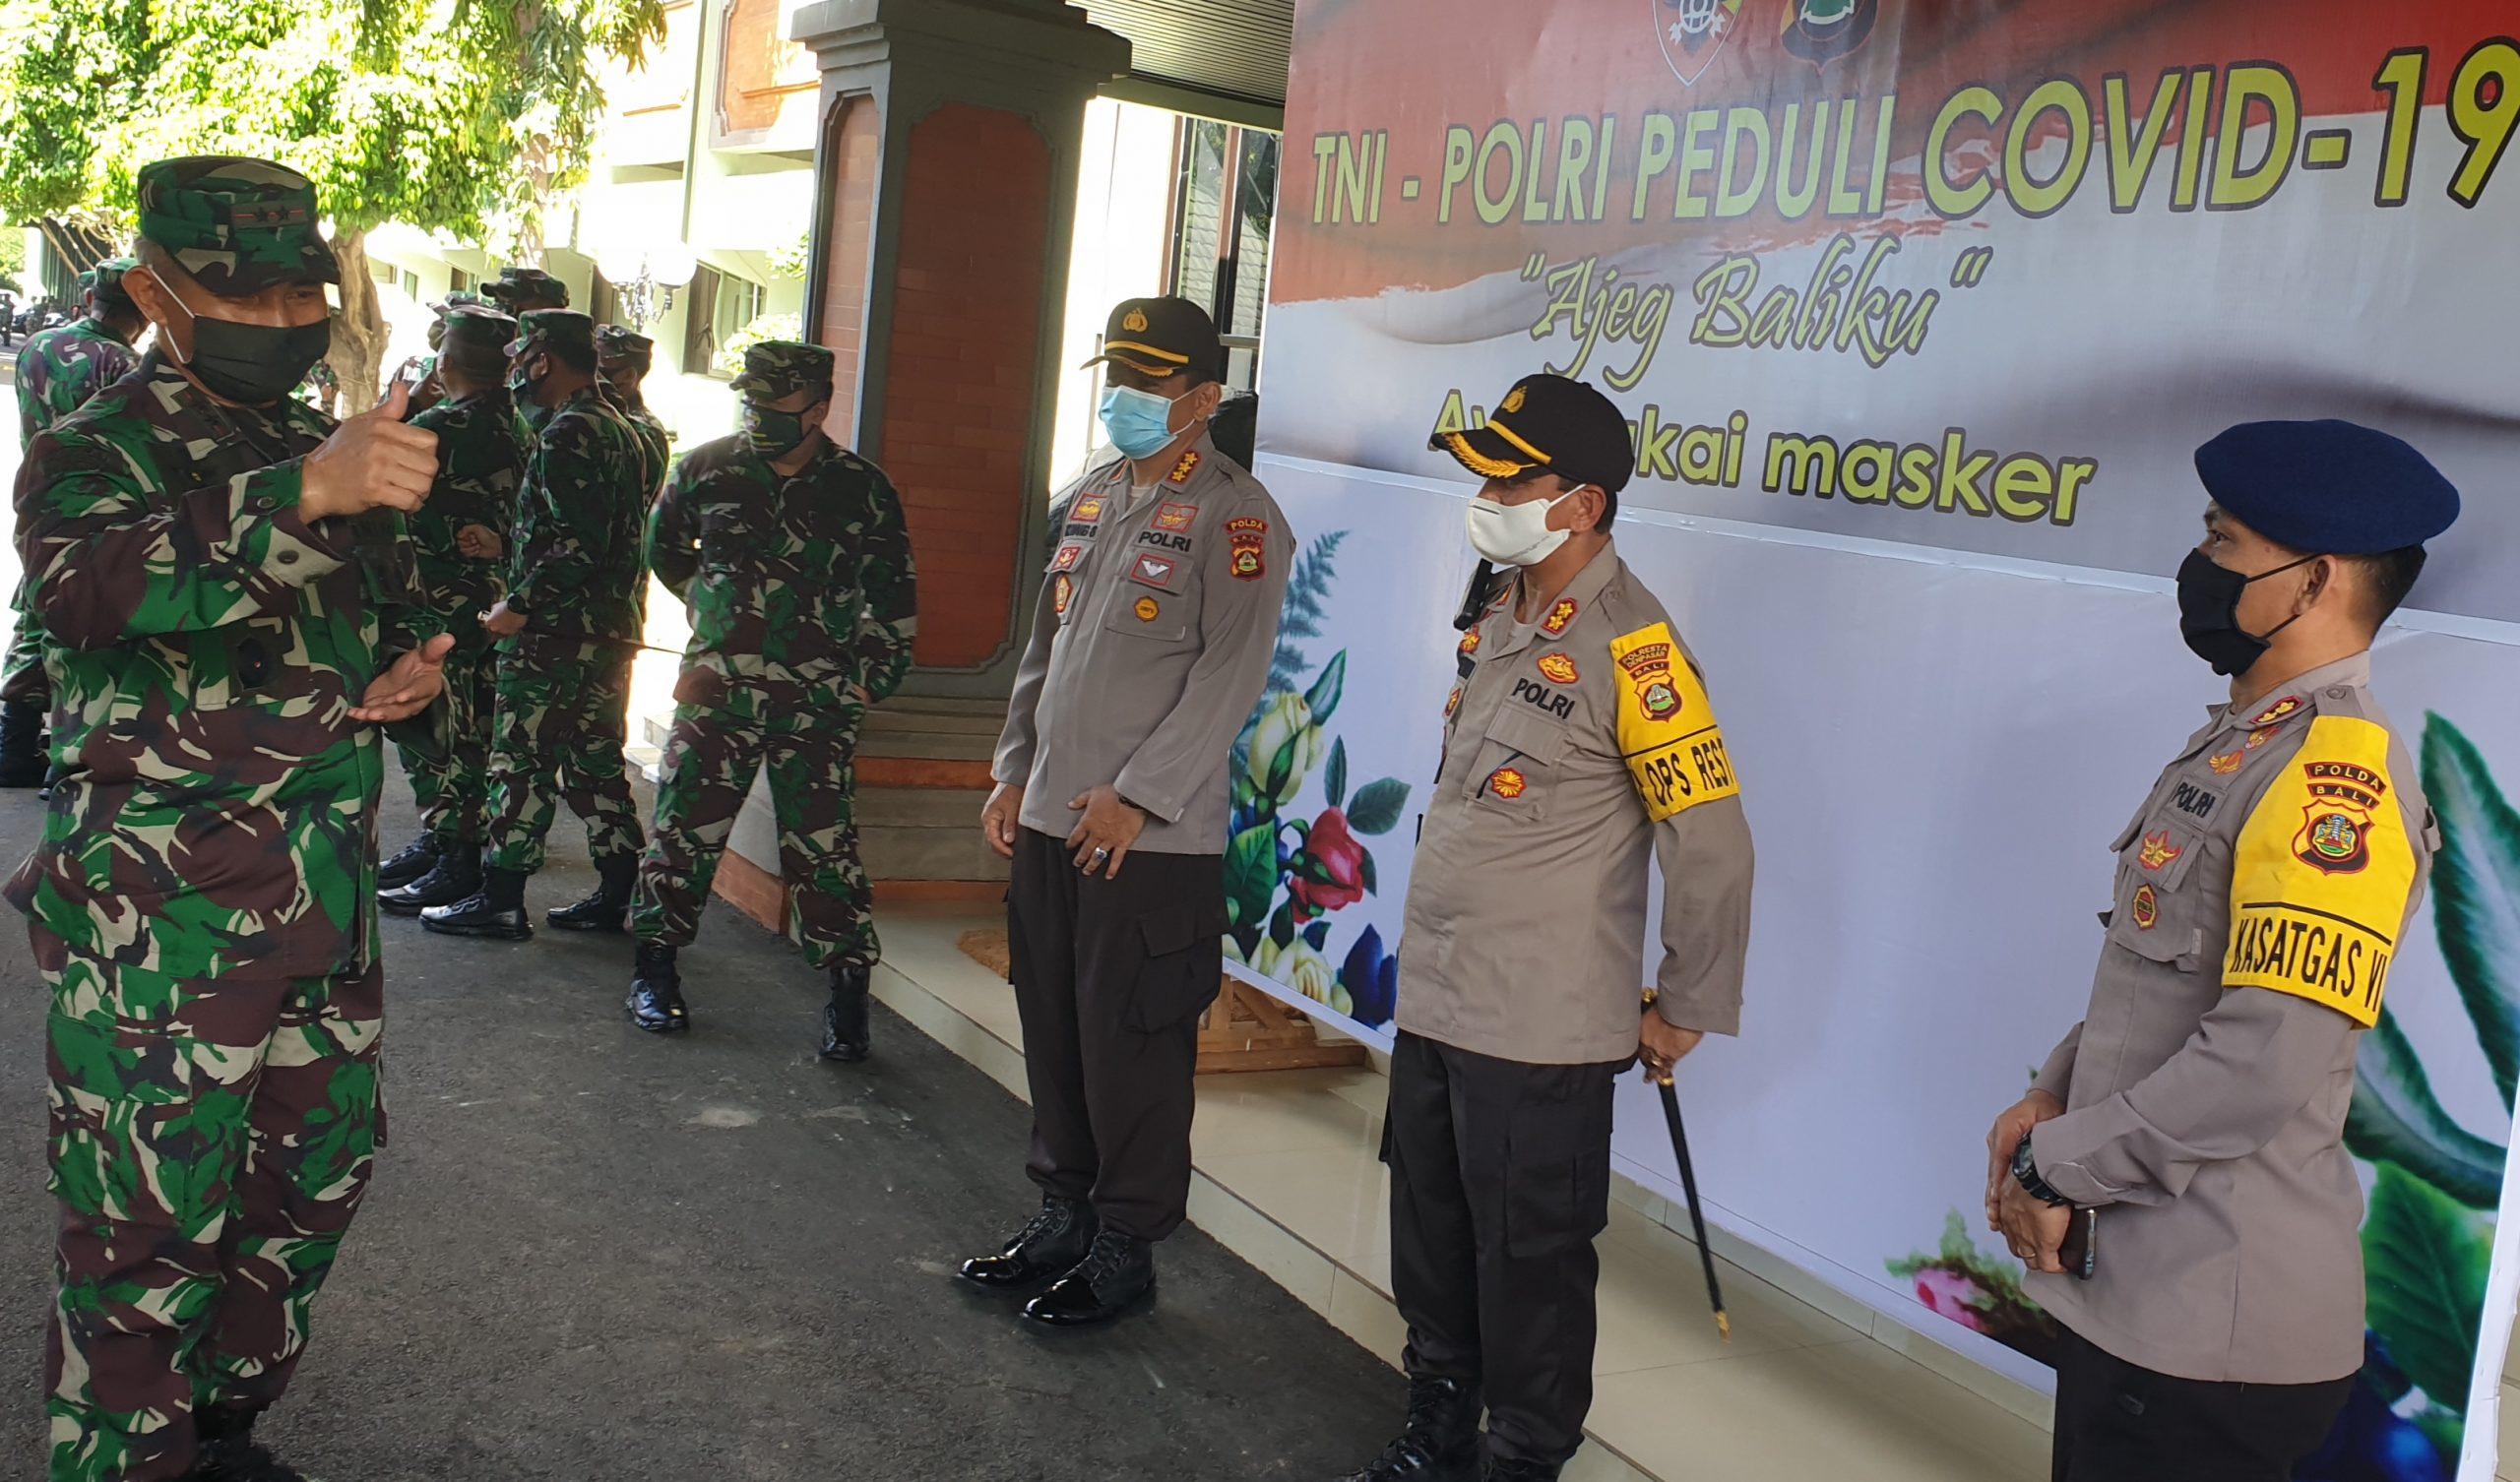 PANGDAM IX/Udayana, Mayjen TNI Benny Susianto, mengacungkan jempol saat berterima kasih kepada pejabat kepolisian yang hadir saat pembagian sembako untuk warga terdampak Covid-19, Kamis (23/4) lalu. Foto: gus hendra